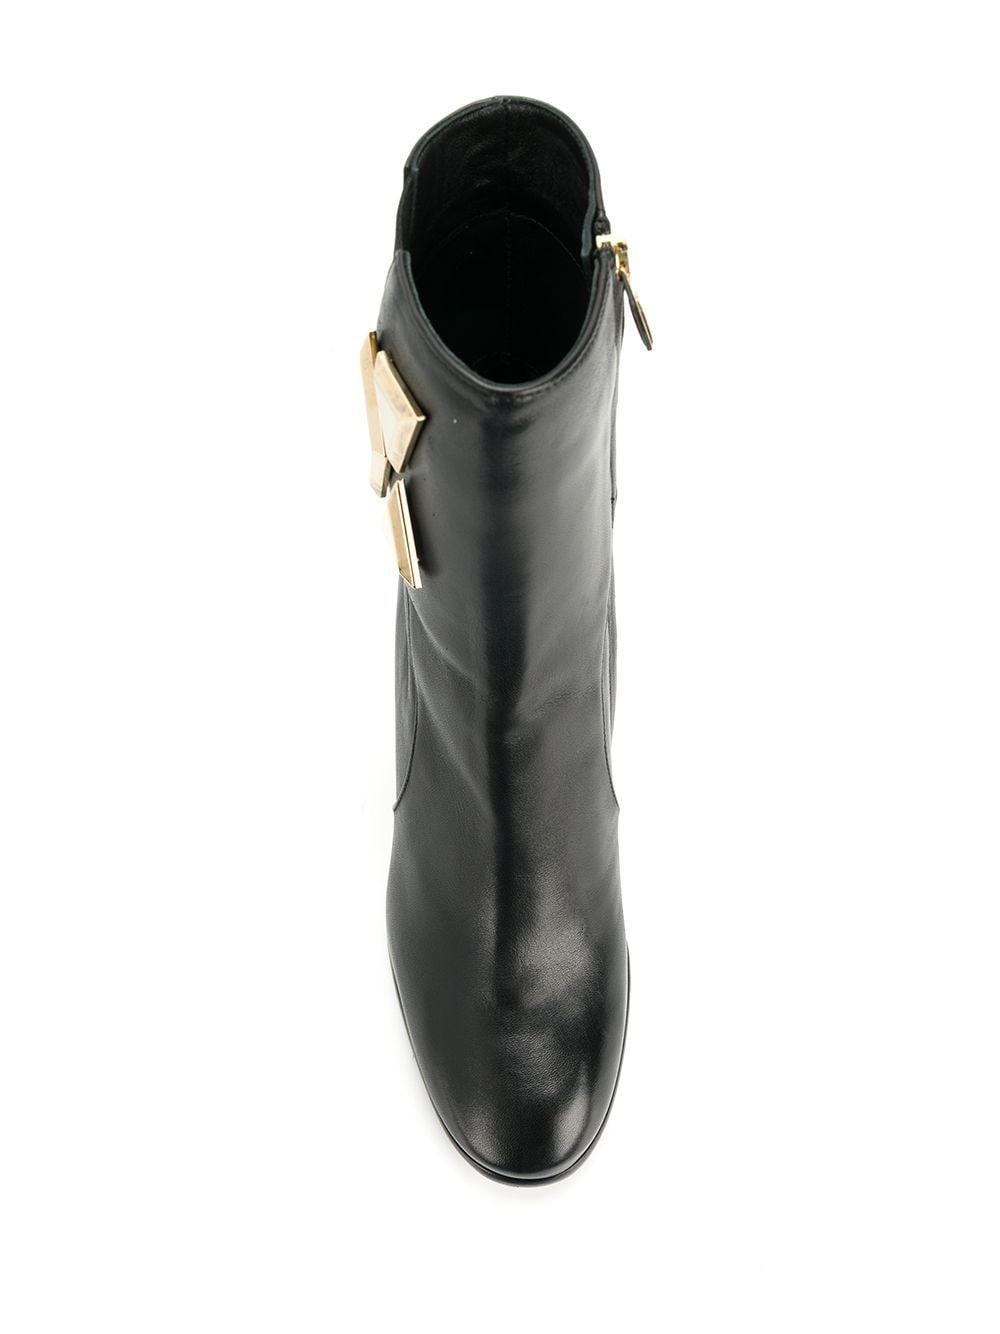 Baldinini Leather Rica Ankle Boots in Black